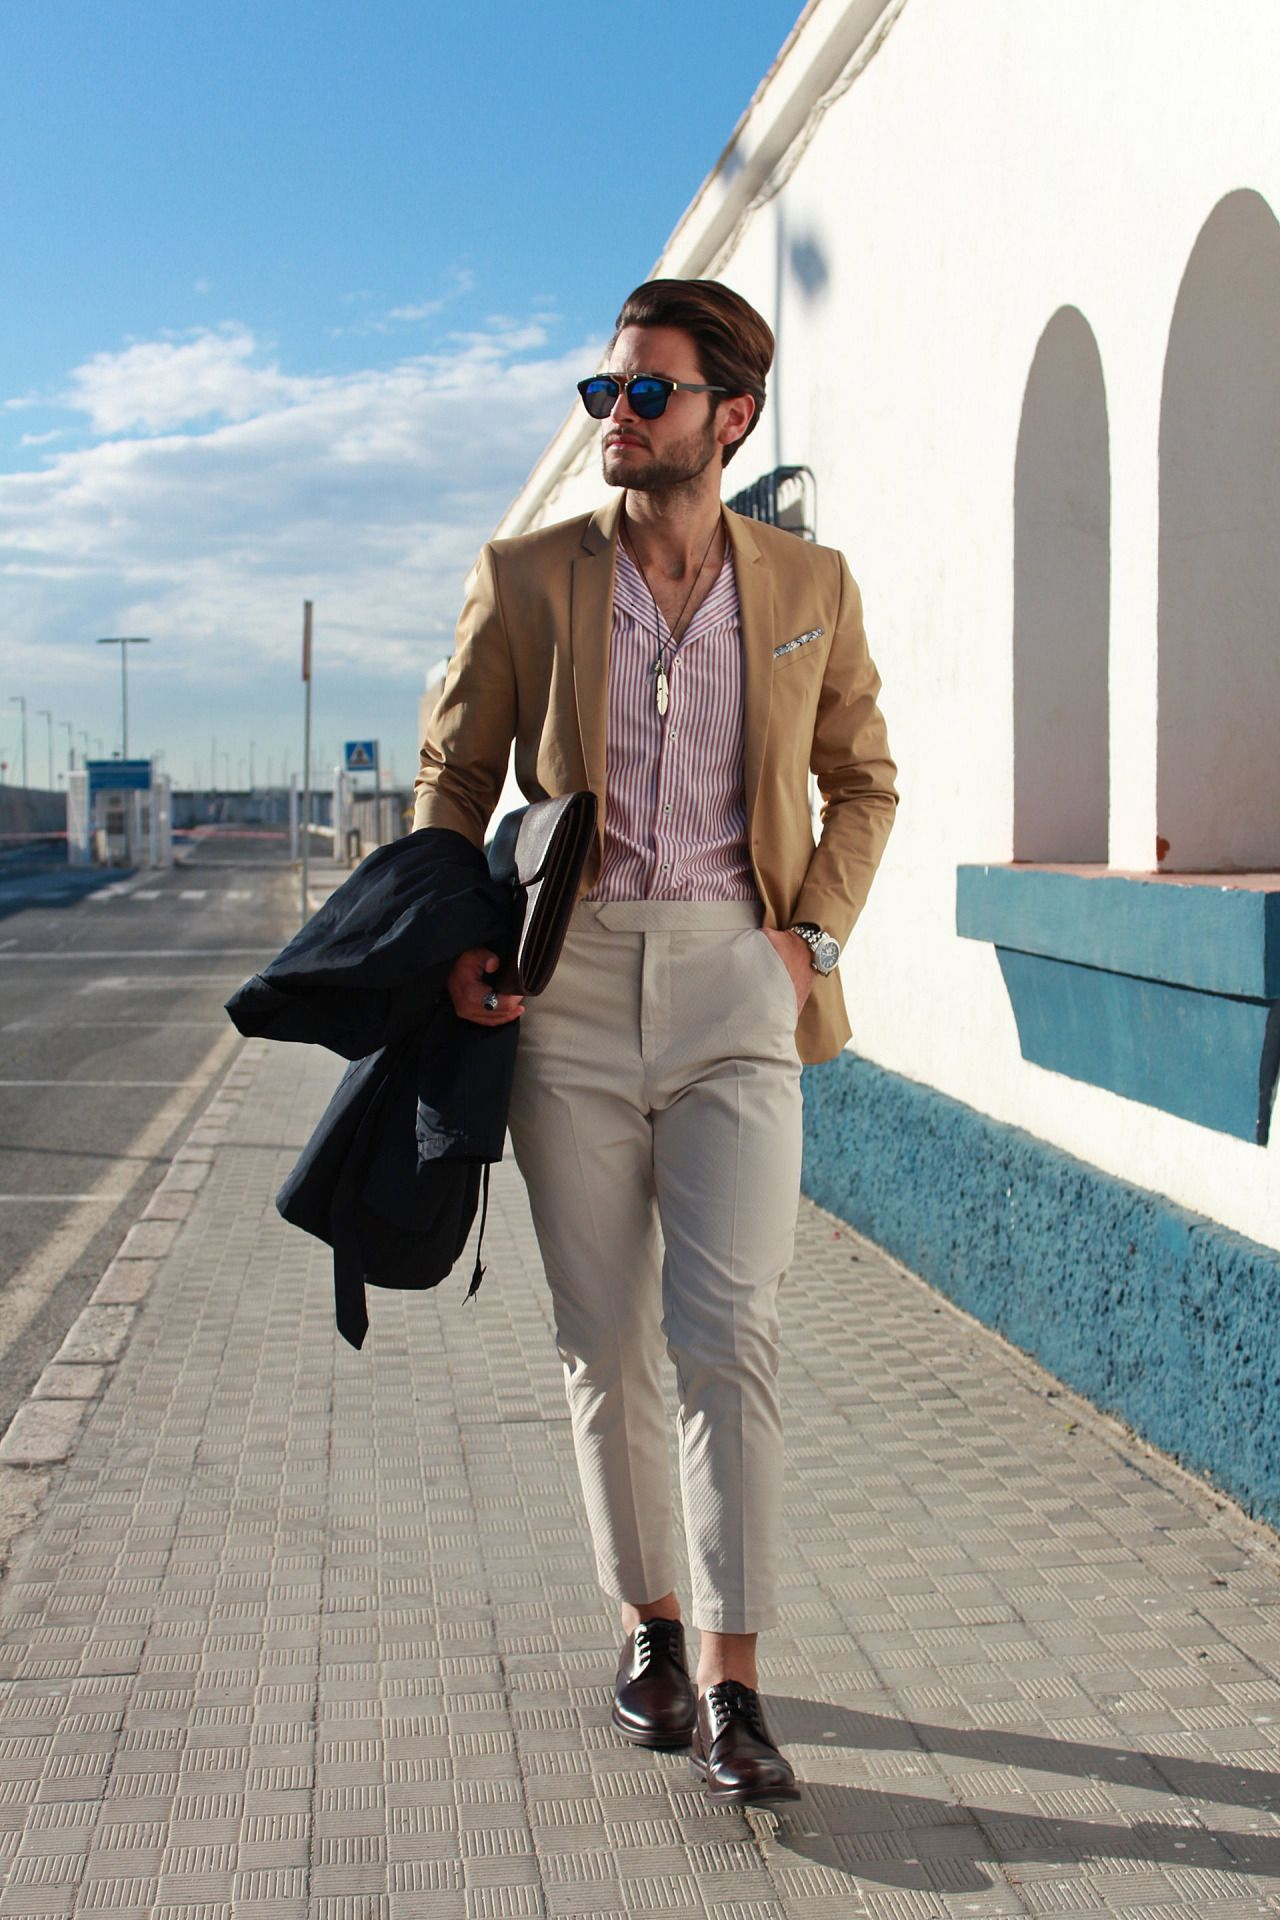 #men #modern #style #guy #Menstyle #fashion #fashionable #cool #Stylish #suits #gentlemen #new #2016 #TRZ #chic #stylish #streetstyle #suits #inspiration #best #dressed